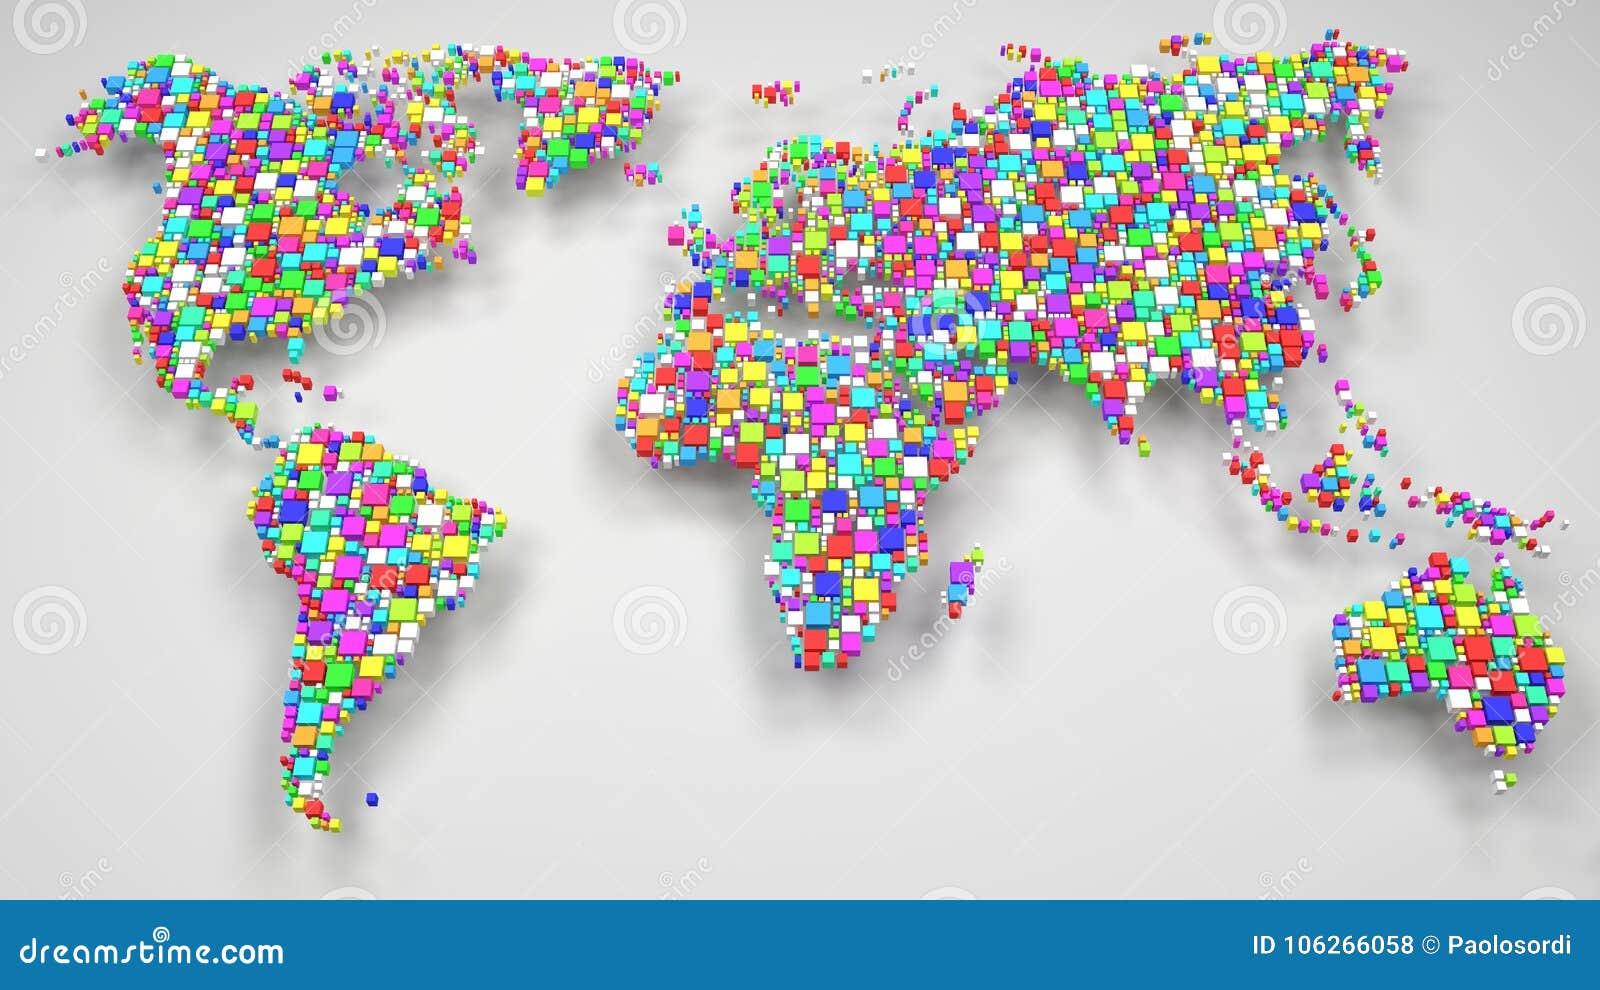 Decorative World Map stock illustration. Illustration of ... on vintage world map, ceramic world map, bedding world map, interior world map, simple world map, ornate world map, seasonal world map, jewelry world map, security world map, solar world map, repositionable world map, fluorescent world map, videogame world map, rounded world map, plants world map, miniature world map, illustration world map, mythological world map, nature world map, distressed world map,